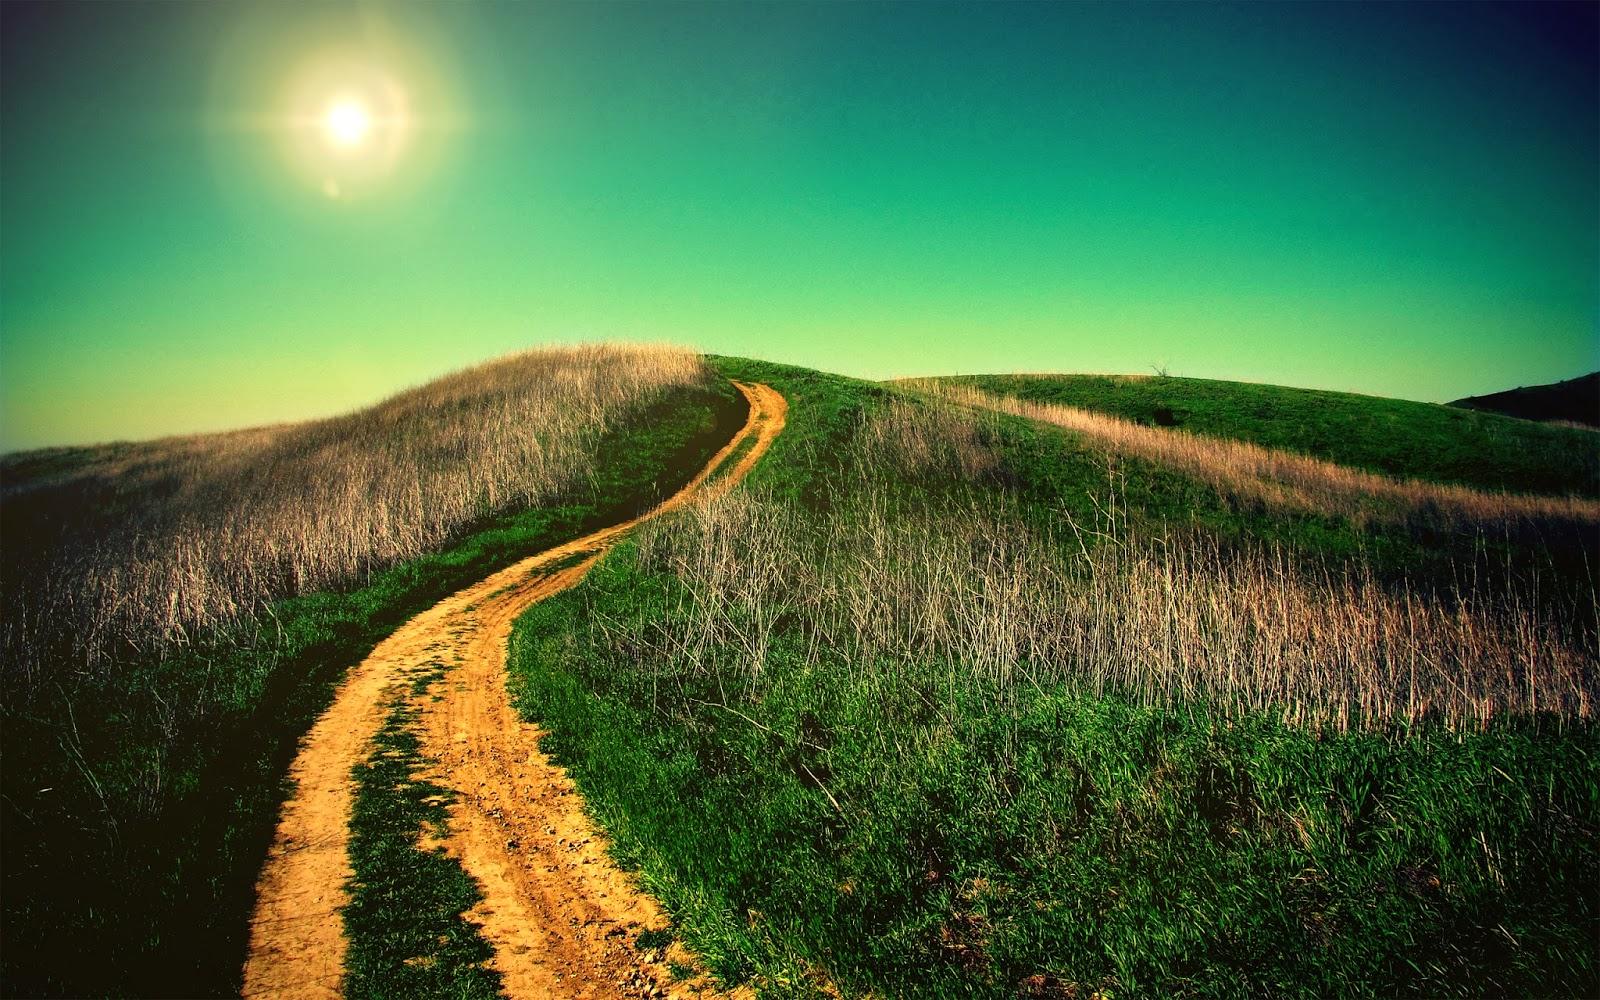 "<img src=""http://1.bp.blogspot.com/-djis3h-URgg/Uu-3BYtMXXI/AAAAAAAAK68/T2jyGAZvnOk/s1600/uphill-road-wallpaper.jpg"" alt=""uphill road wallpaper"" />"